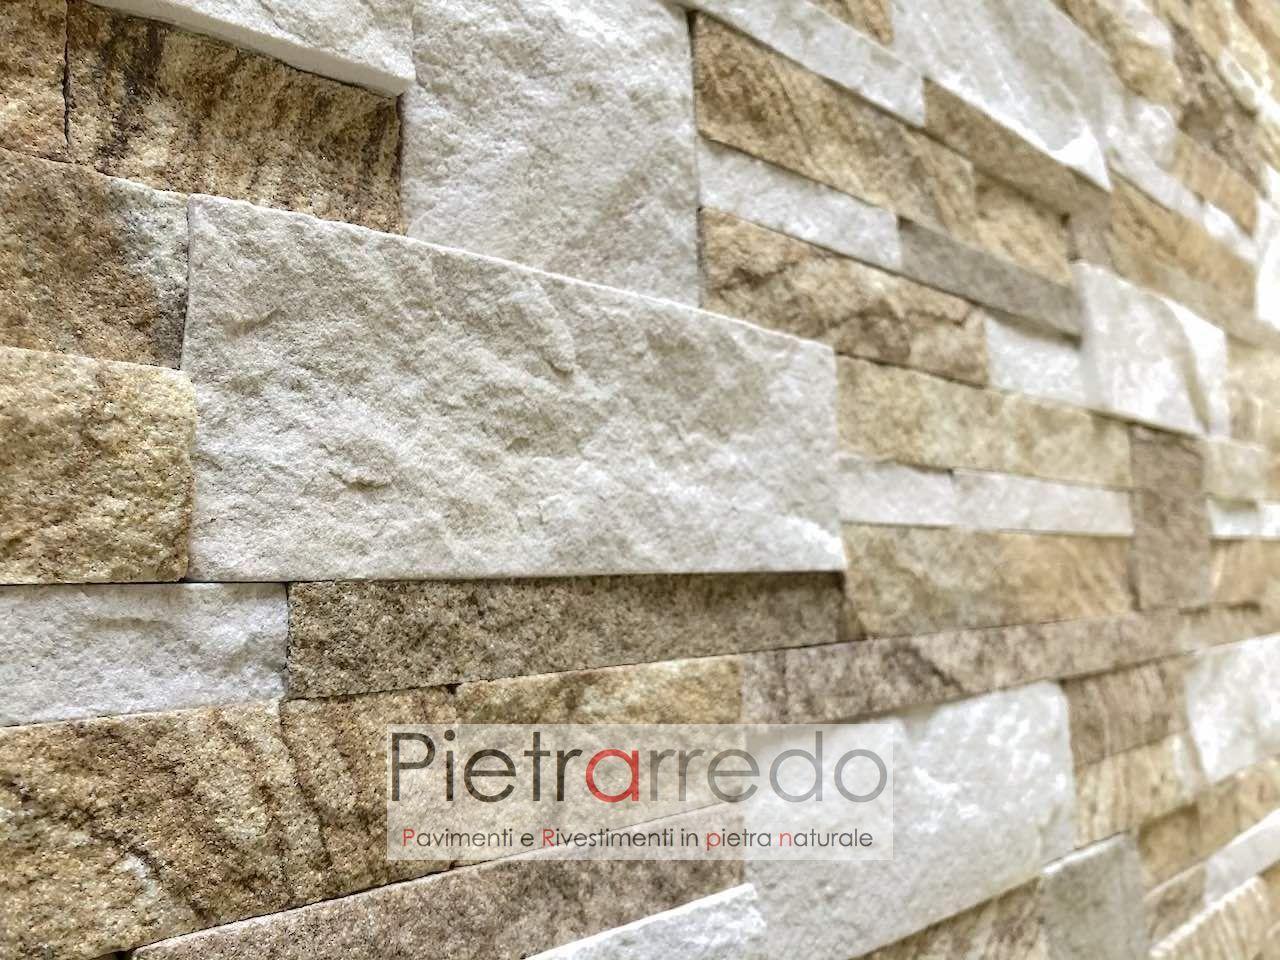 Rivestimento pietra arenaria scozzese chiara offerta a u ac mq